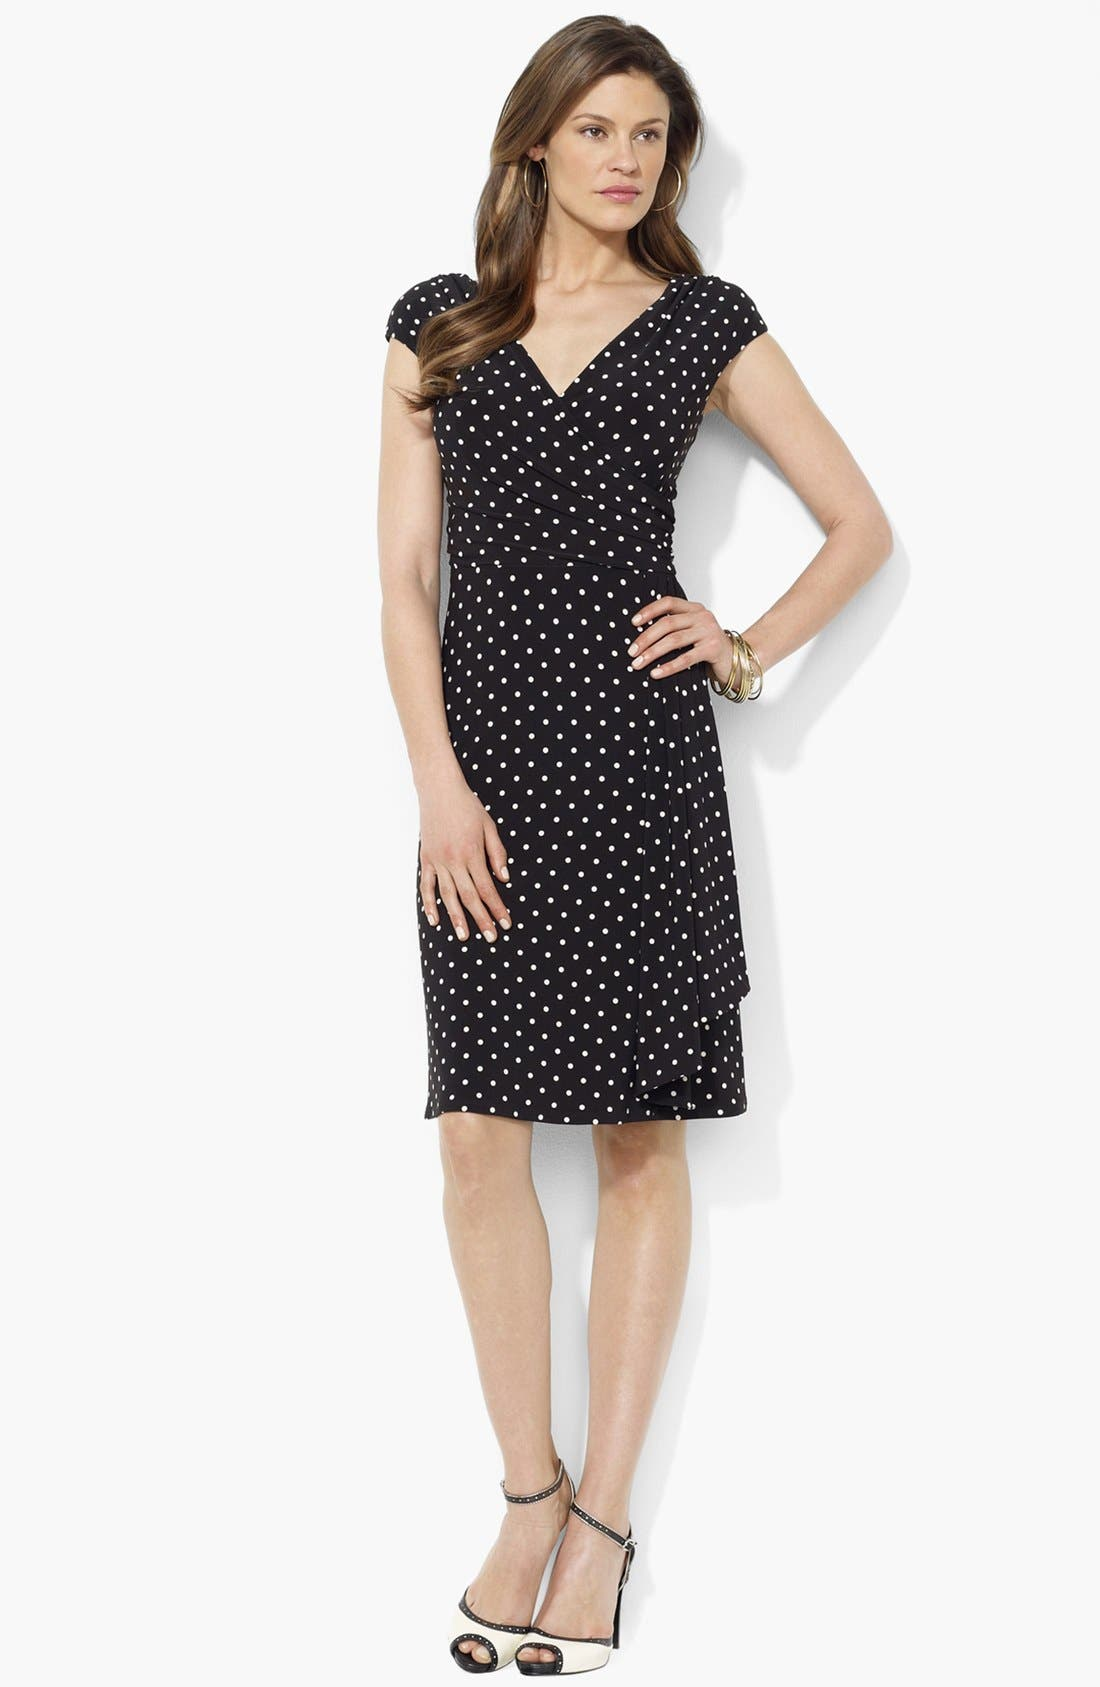 Alternate Image 1 Selected - Lauren Ralph Lauren Draped Polka Dot Jersey Dress